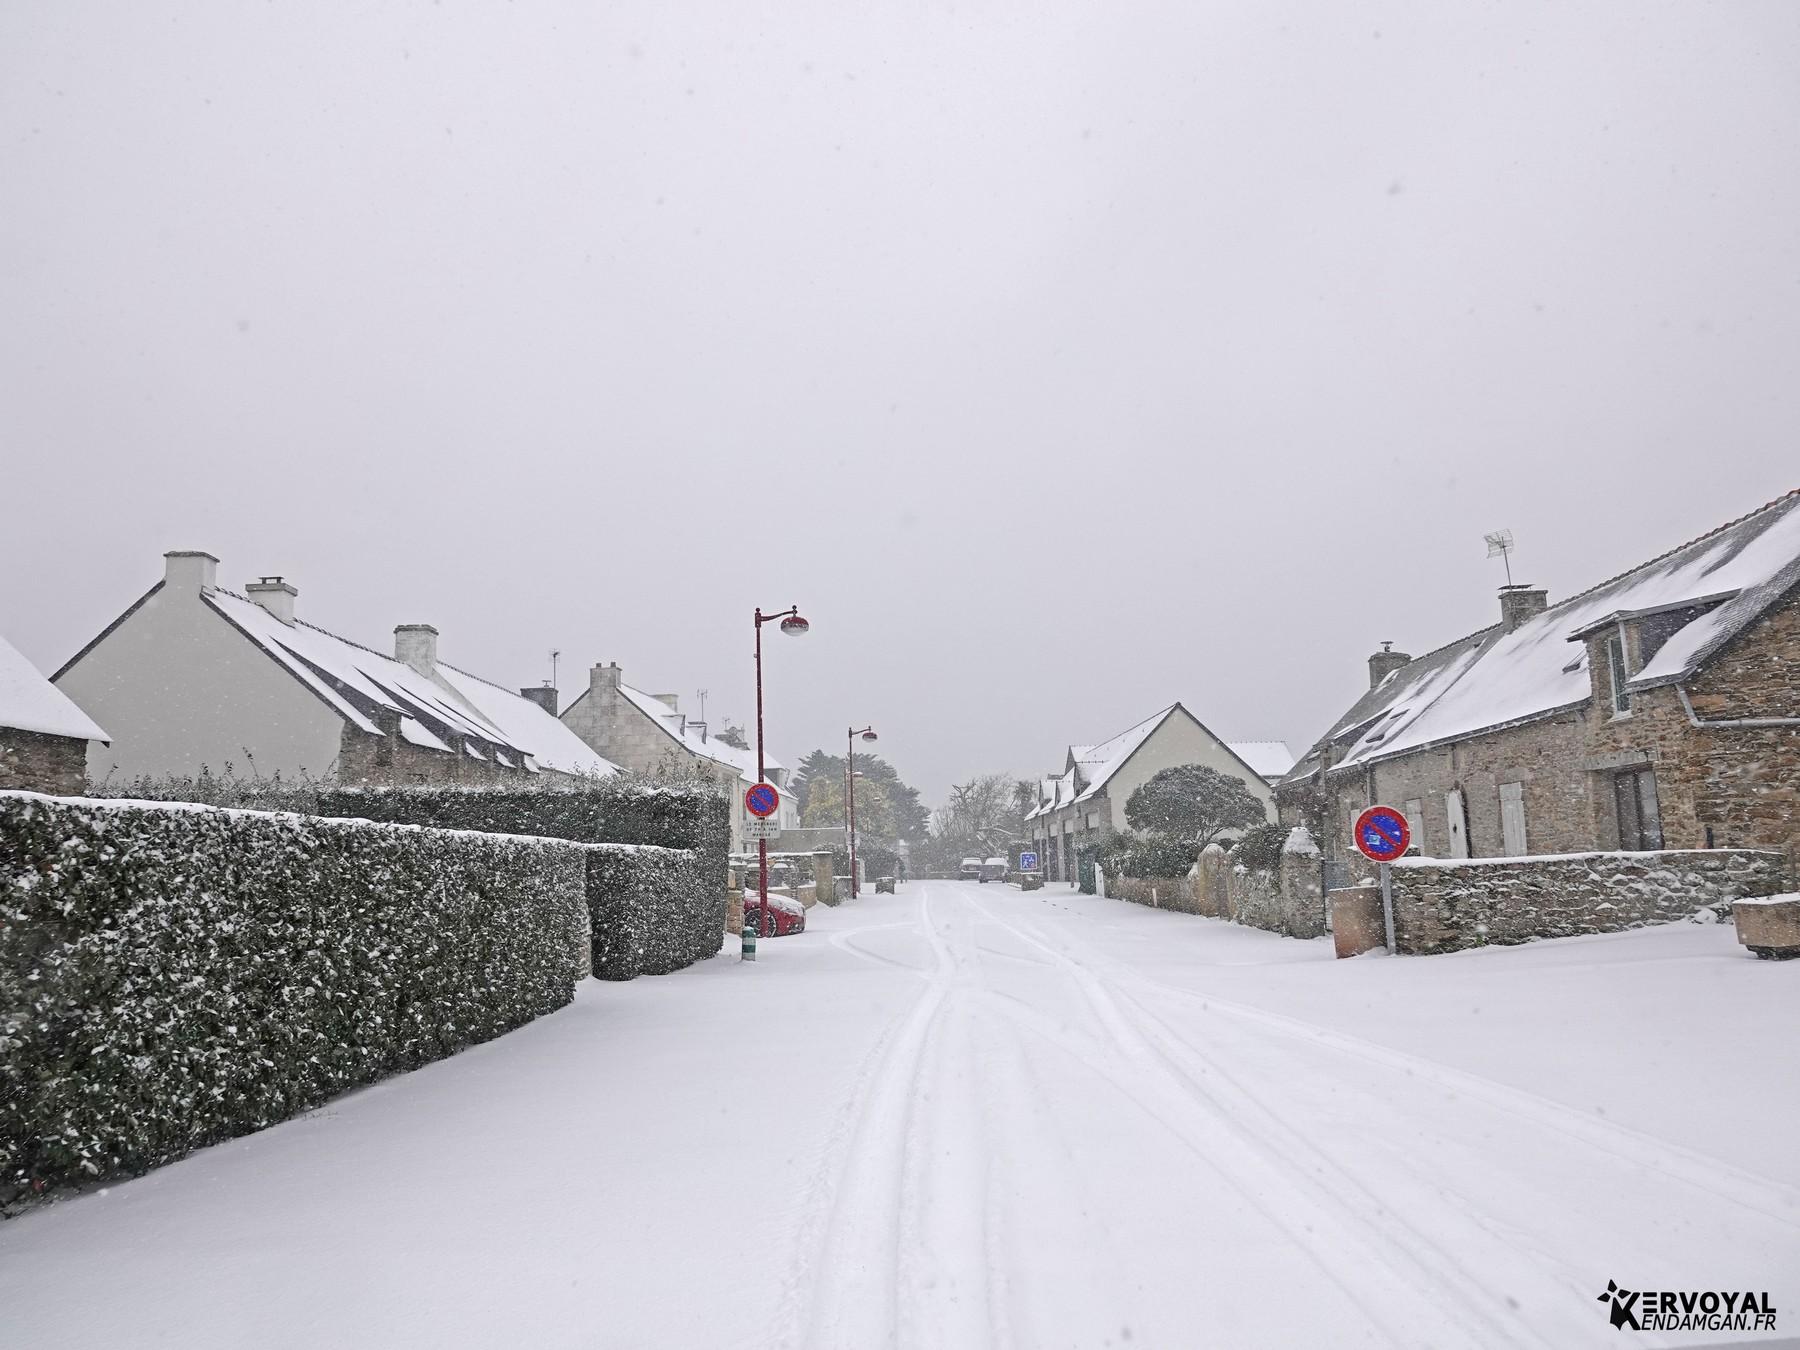 neige à kervoyal 11 février 2021 damgan morbihan (32)